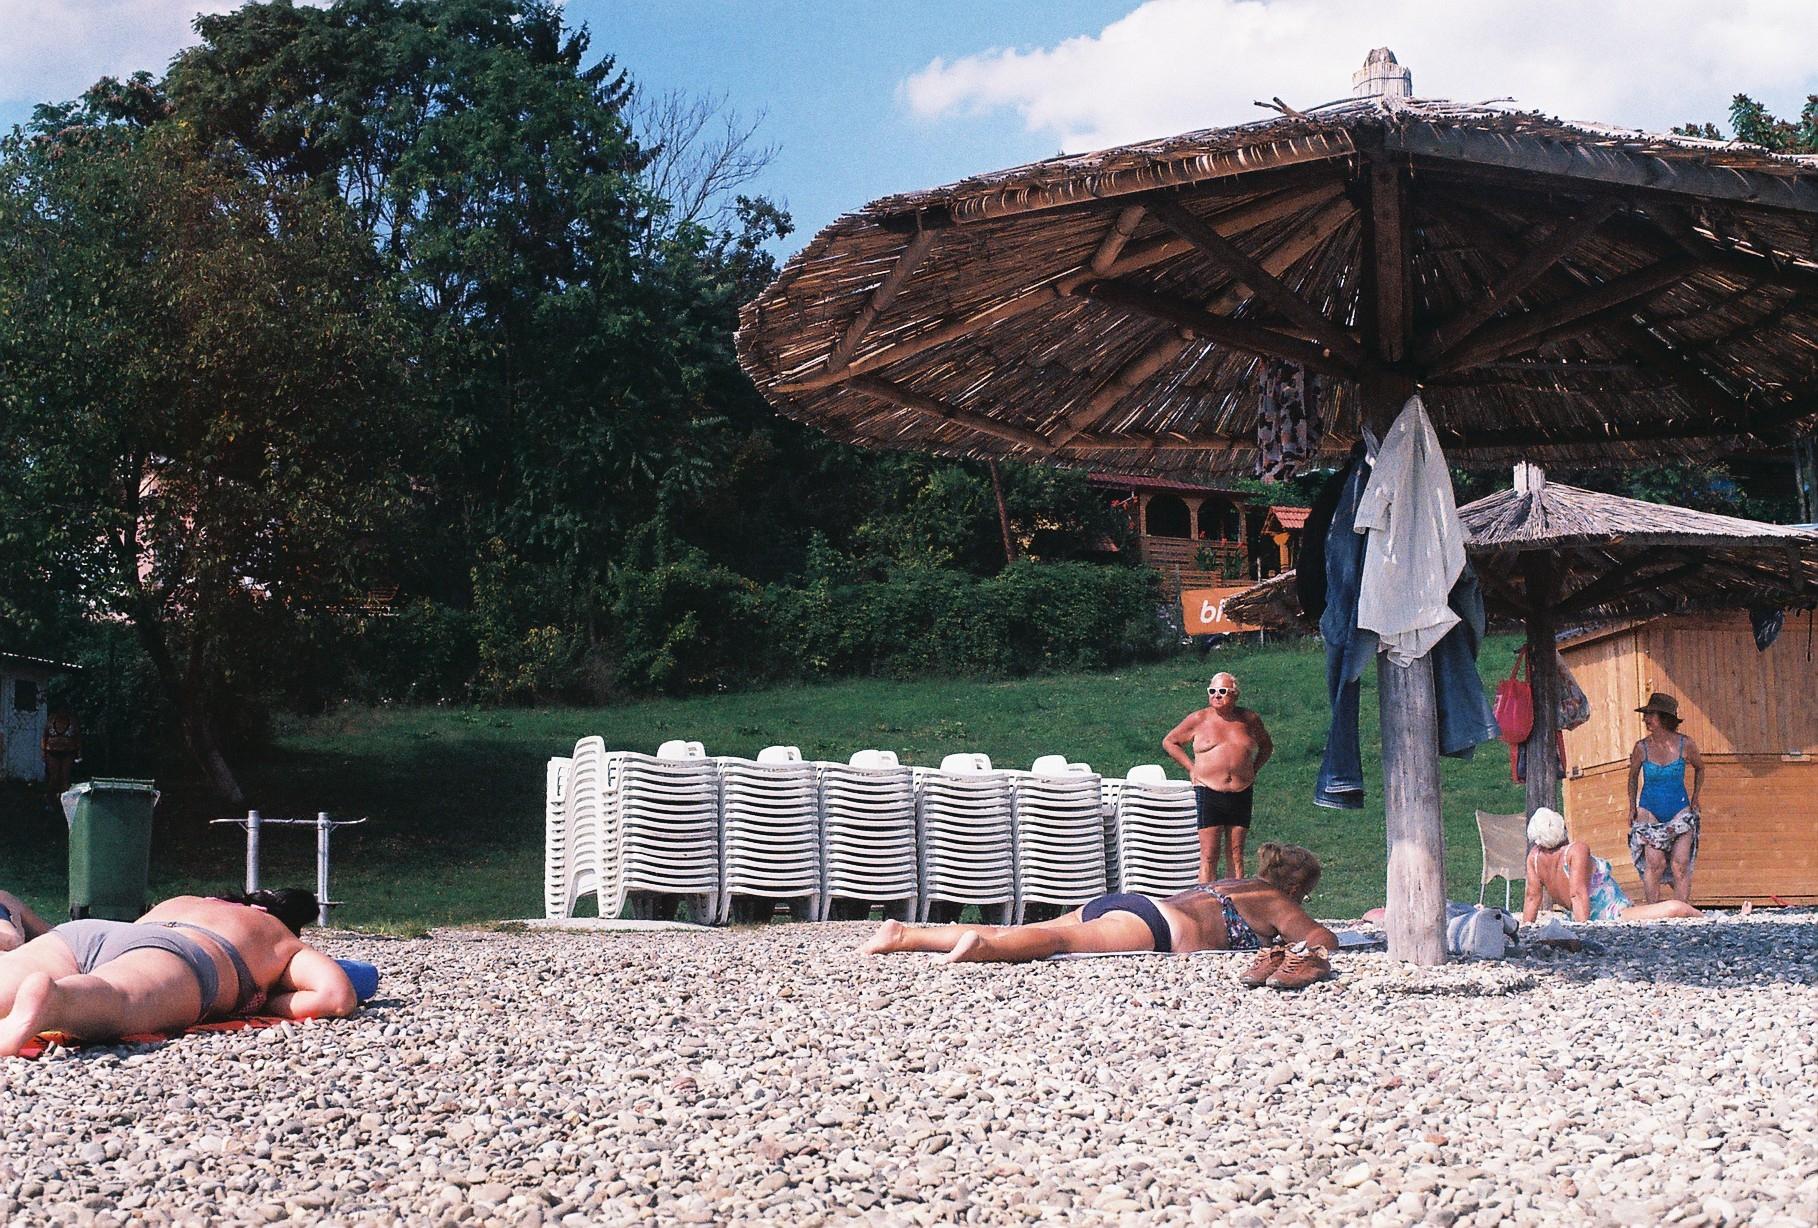 days beach - analogphotography, zenit11 - leila_h | ello